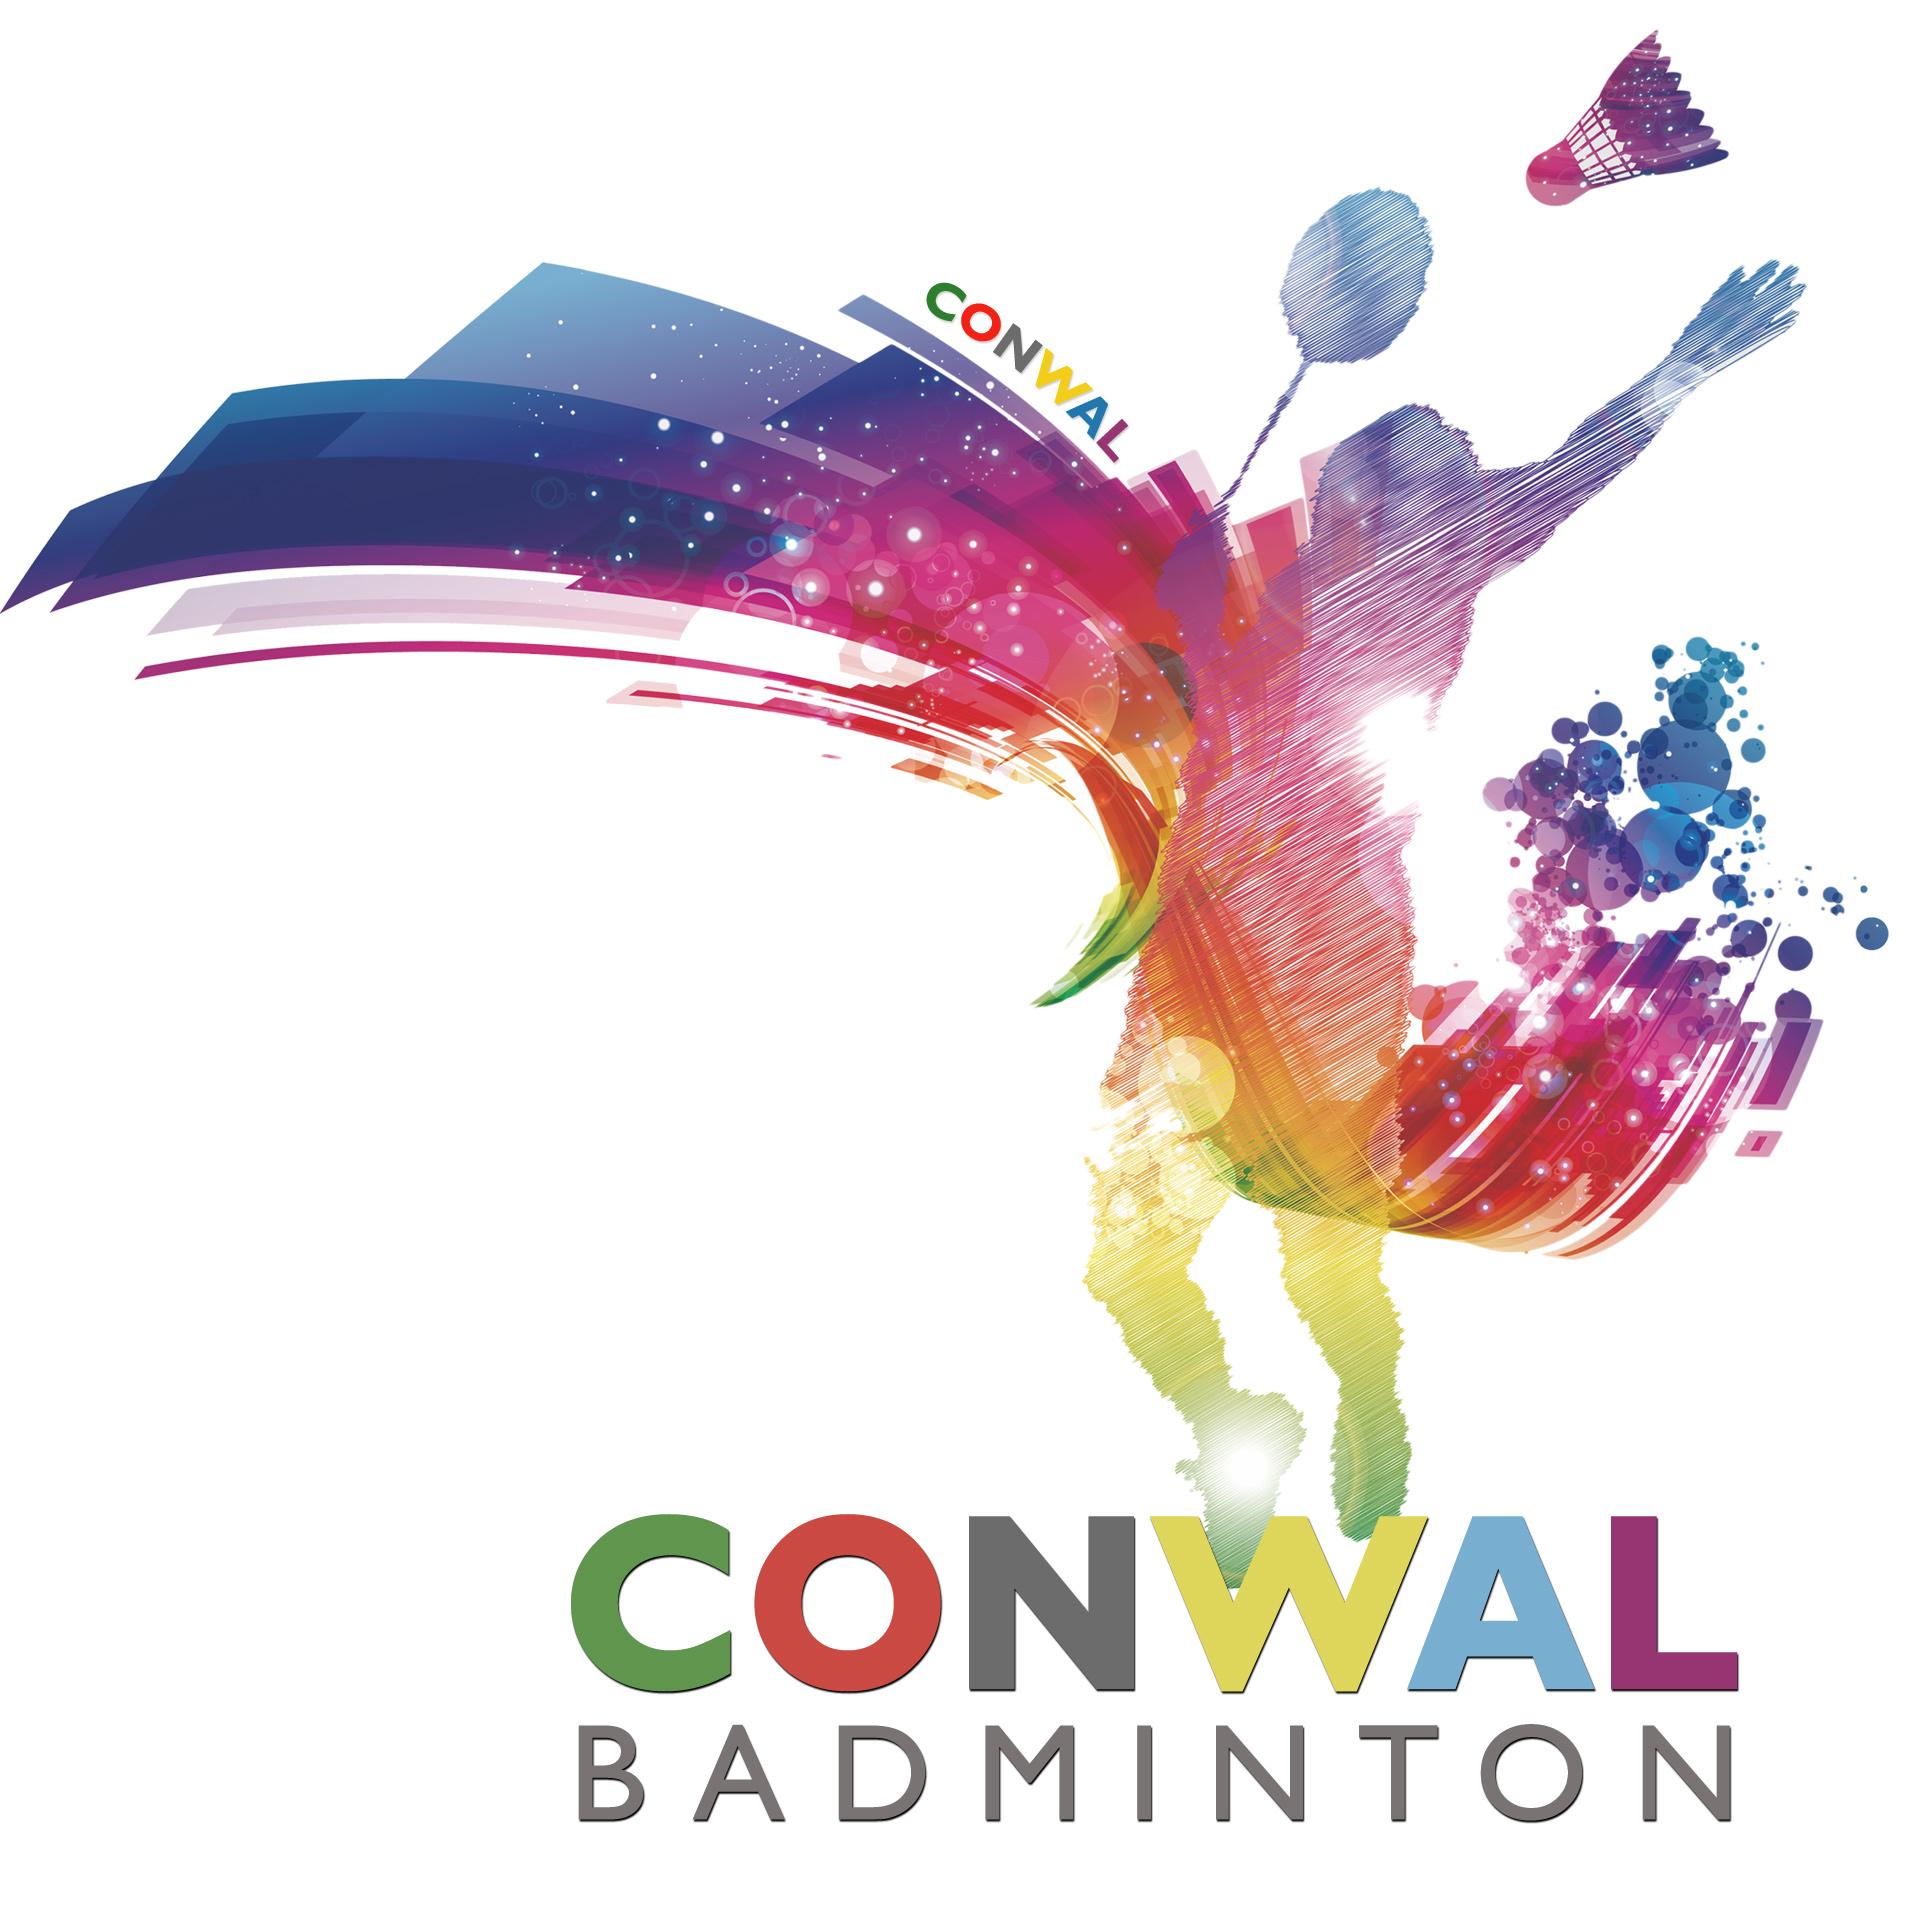 Conwal Badminton Club